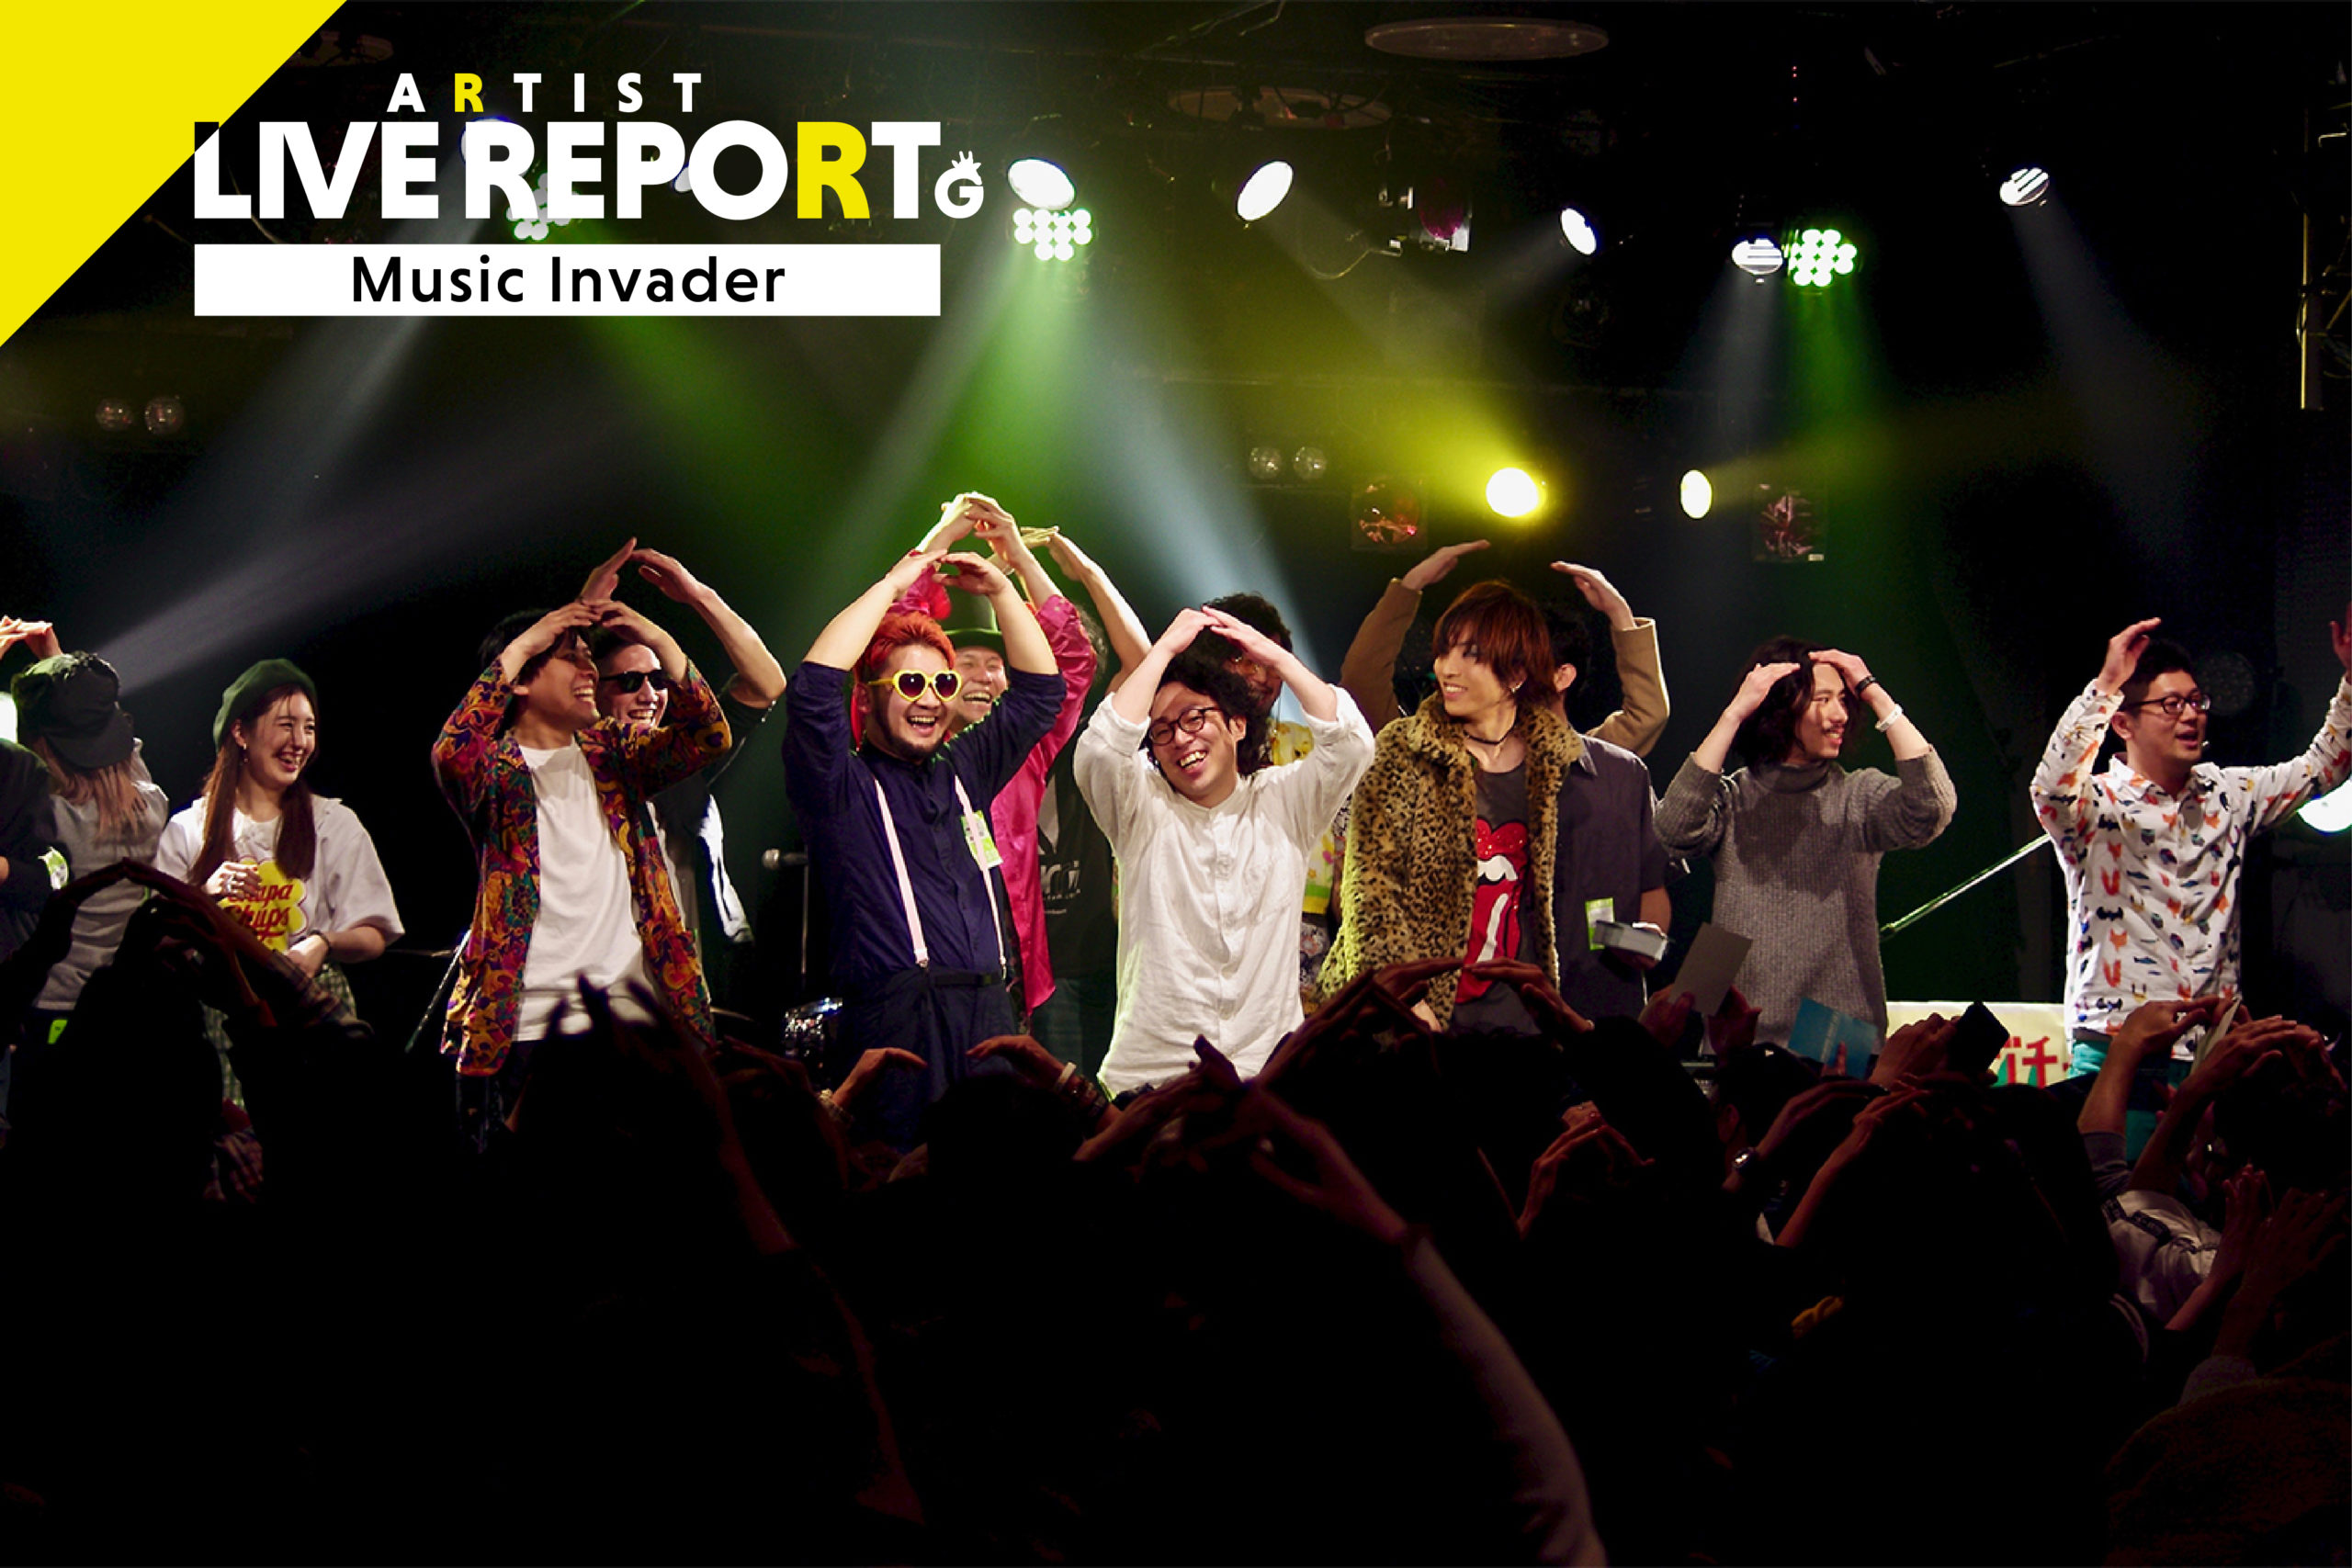 「【Music Invader 後編】ライブレポ/感謝の詰まった感動のライブイベント『Music Invader』in 大阪MUSE」のアイキャッチ画像